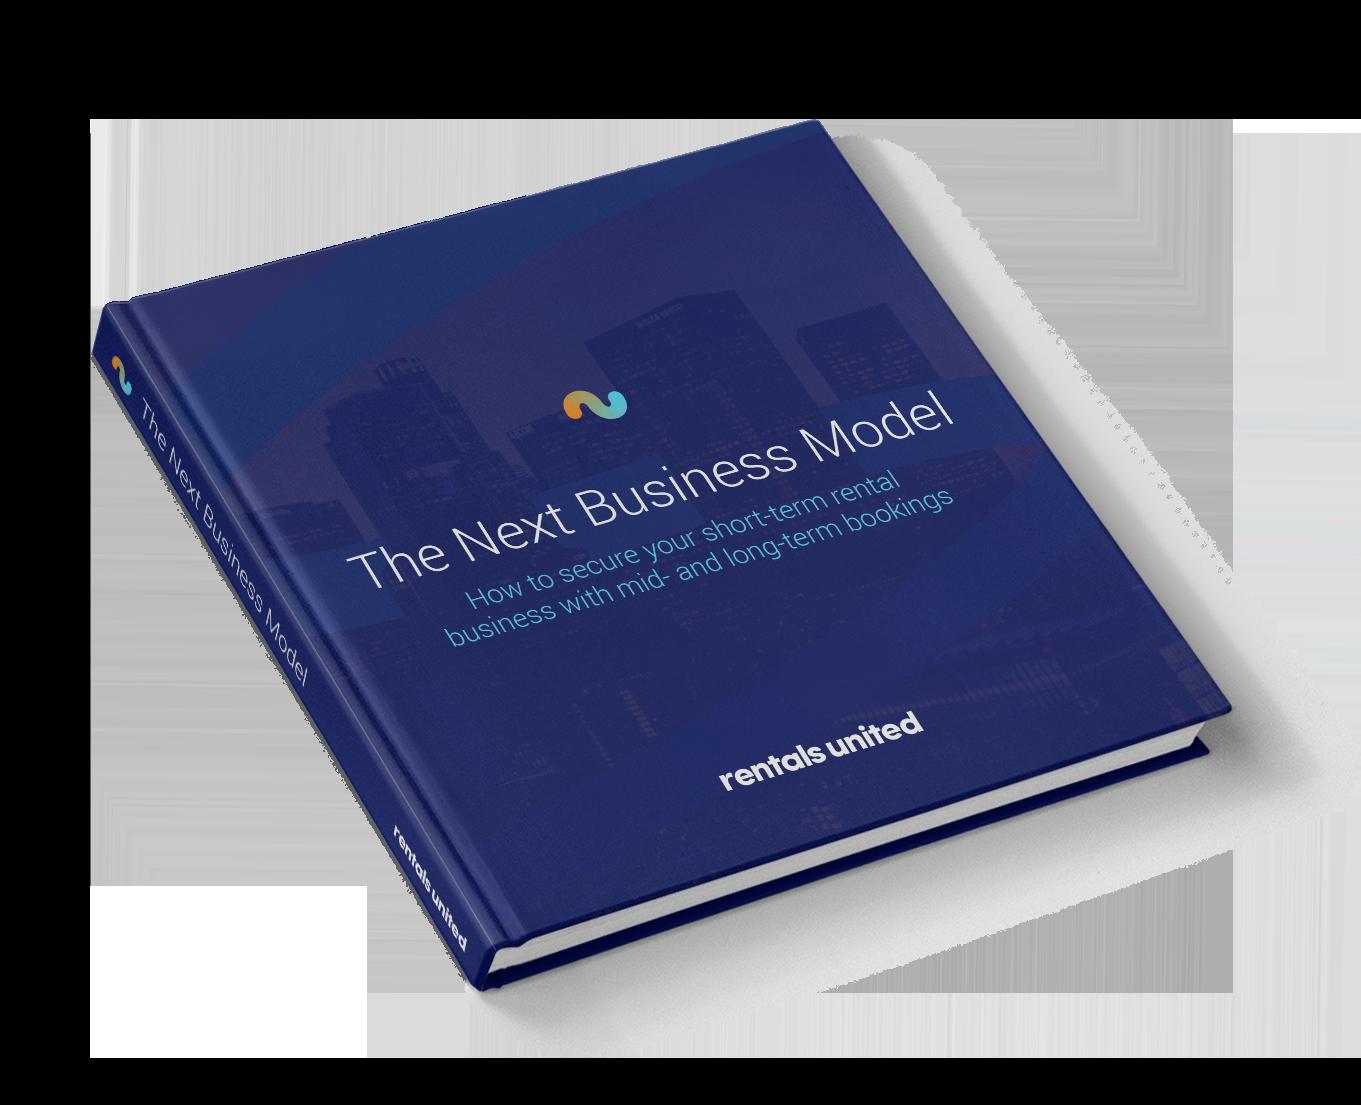 eBook_mockup_the-next-bussines-model_02